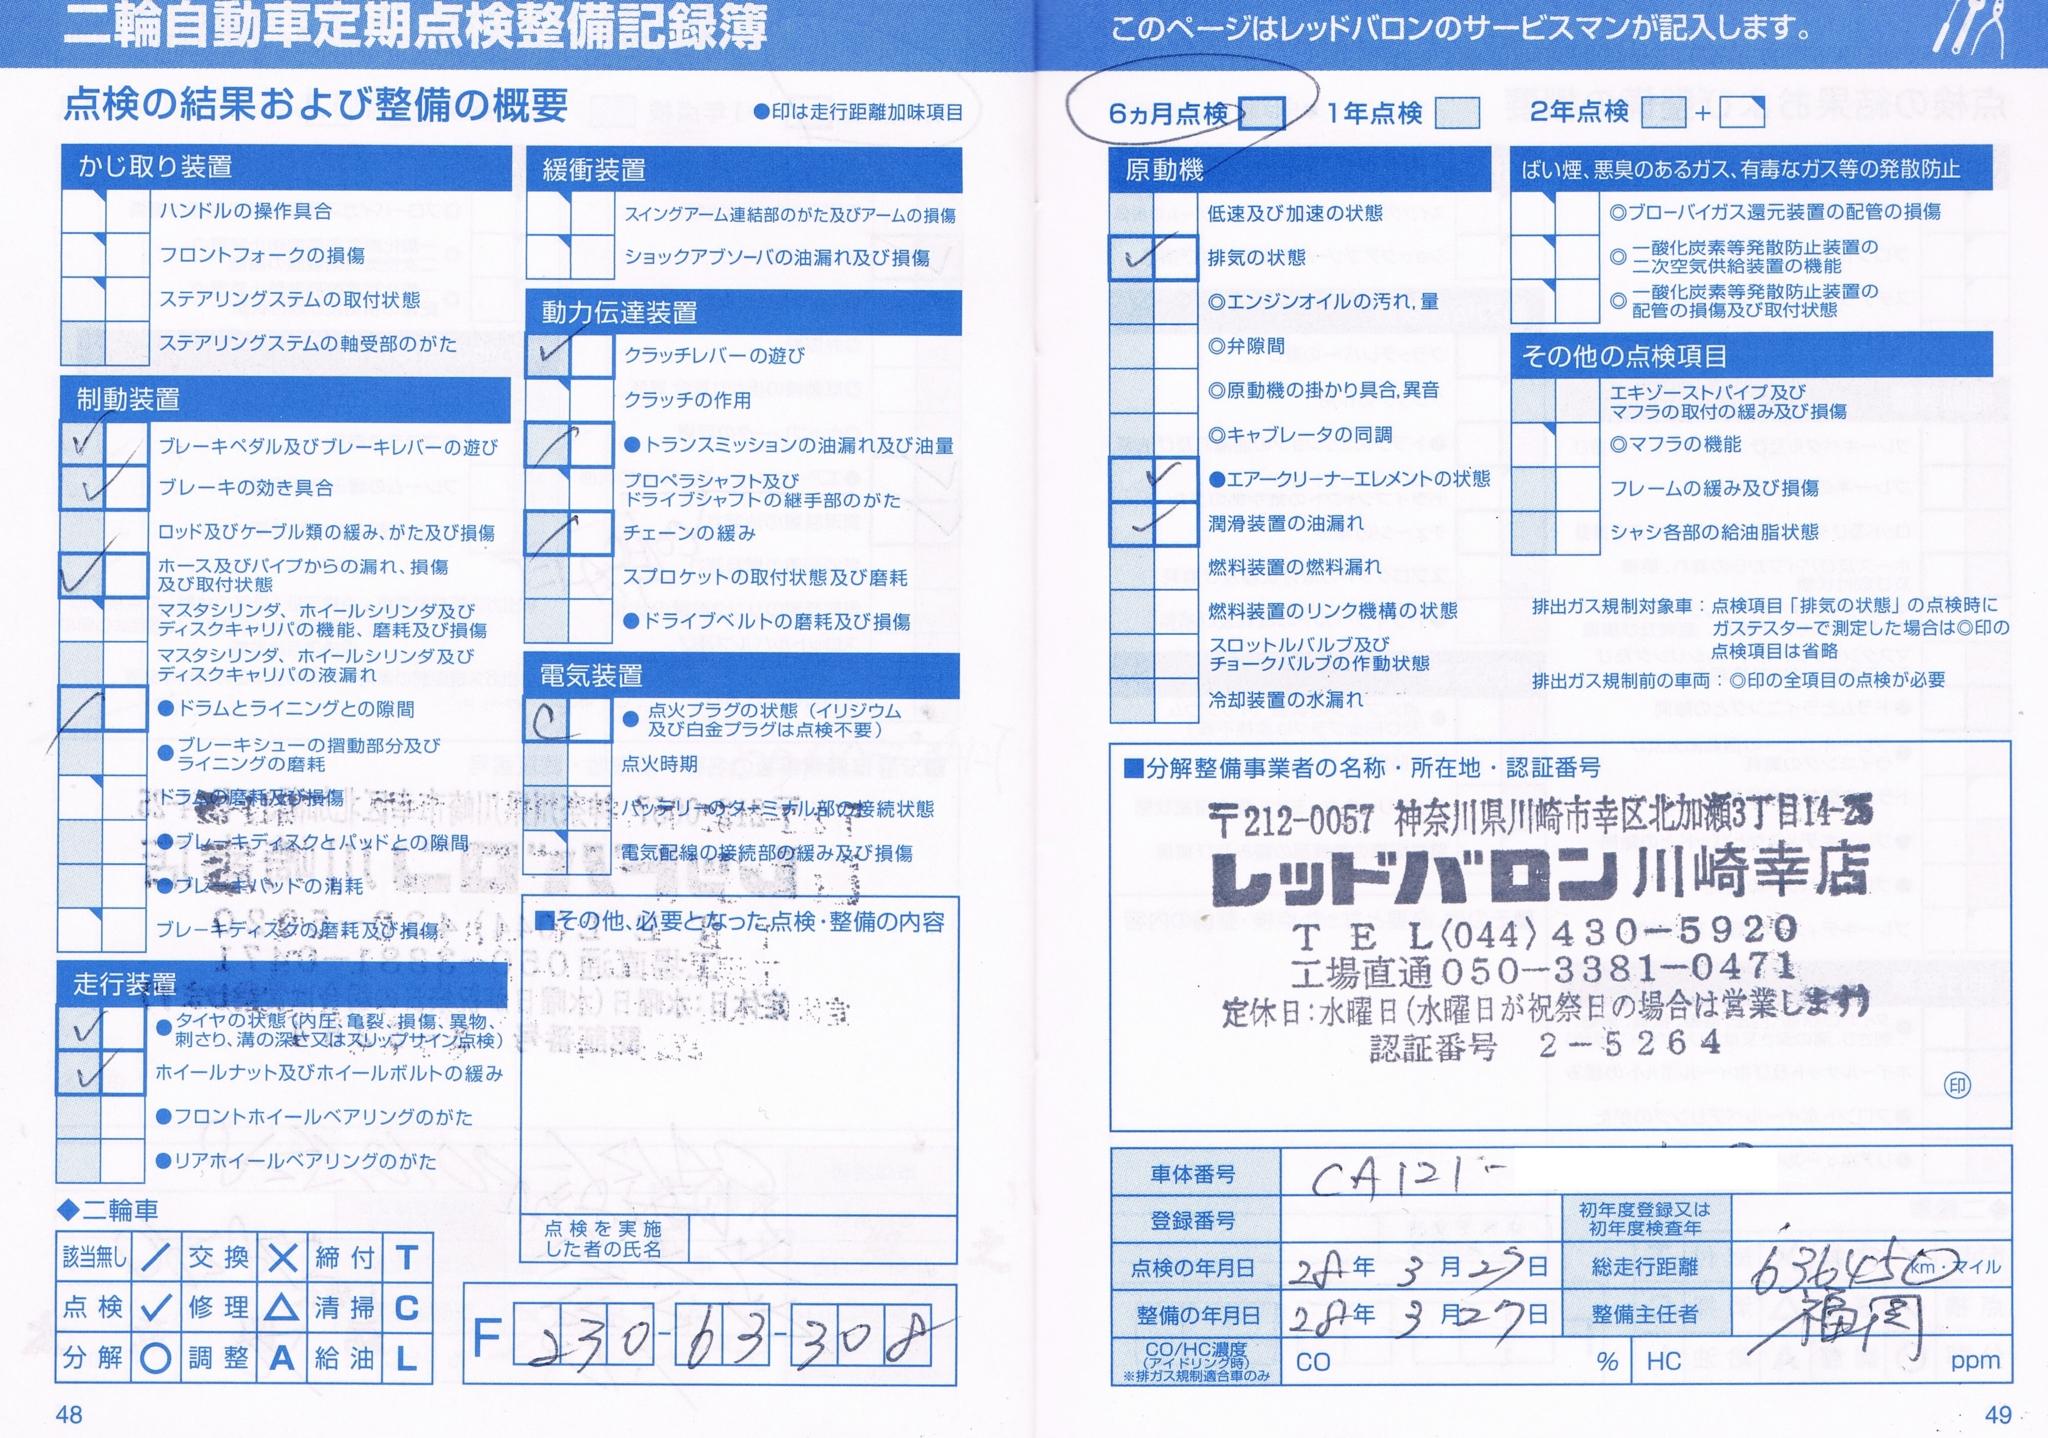 f:id:ToshUeno:20160327223950j:plain